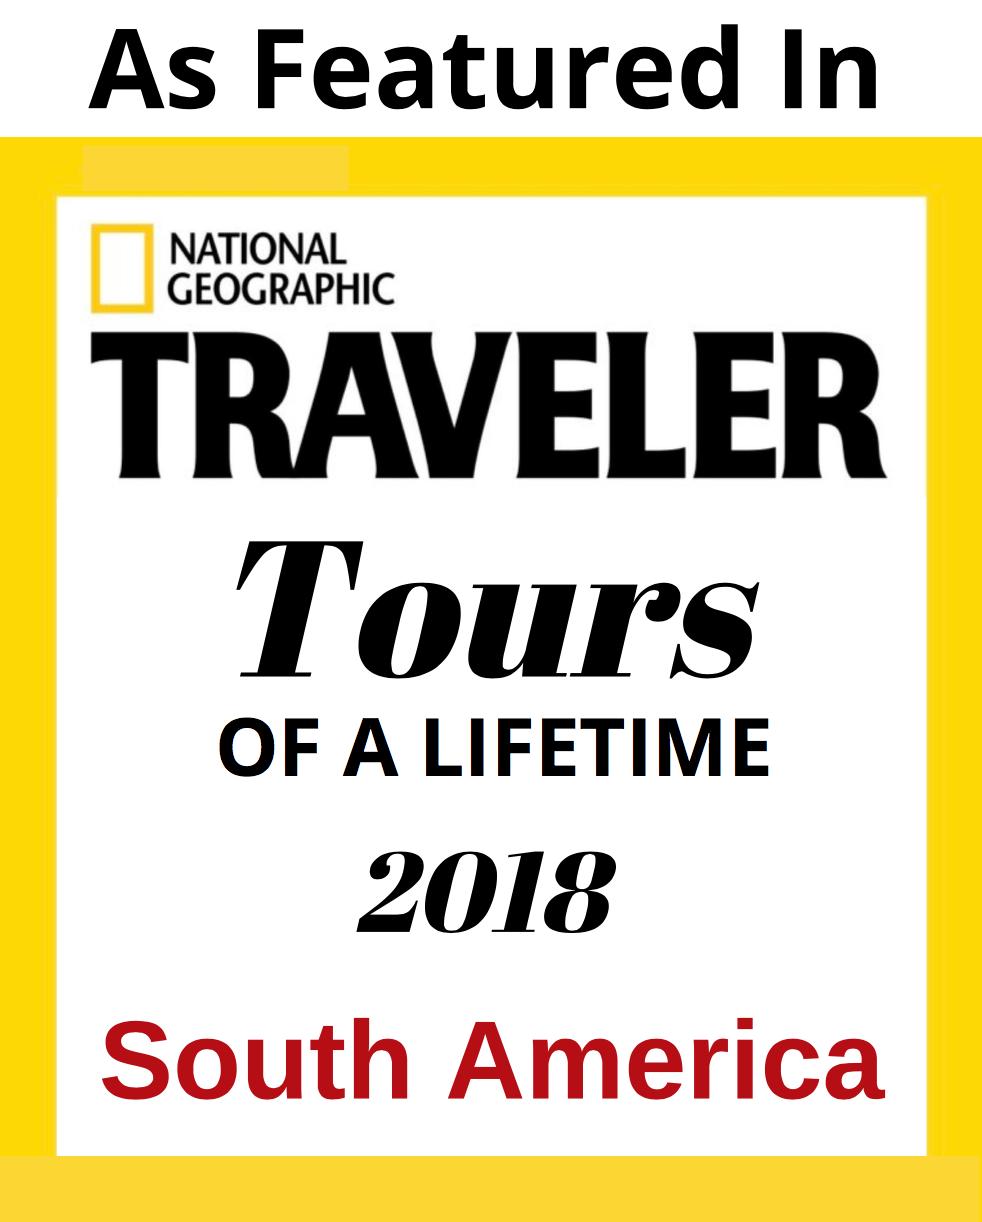 Bolivian Salt Flats Tour | Hiking & Adventure Travel in the